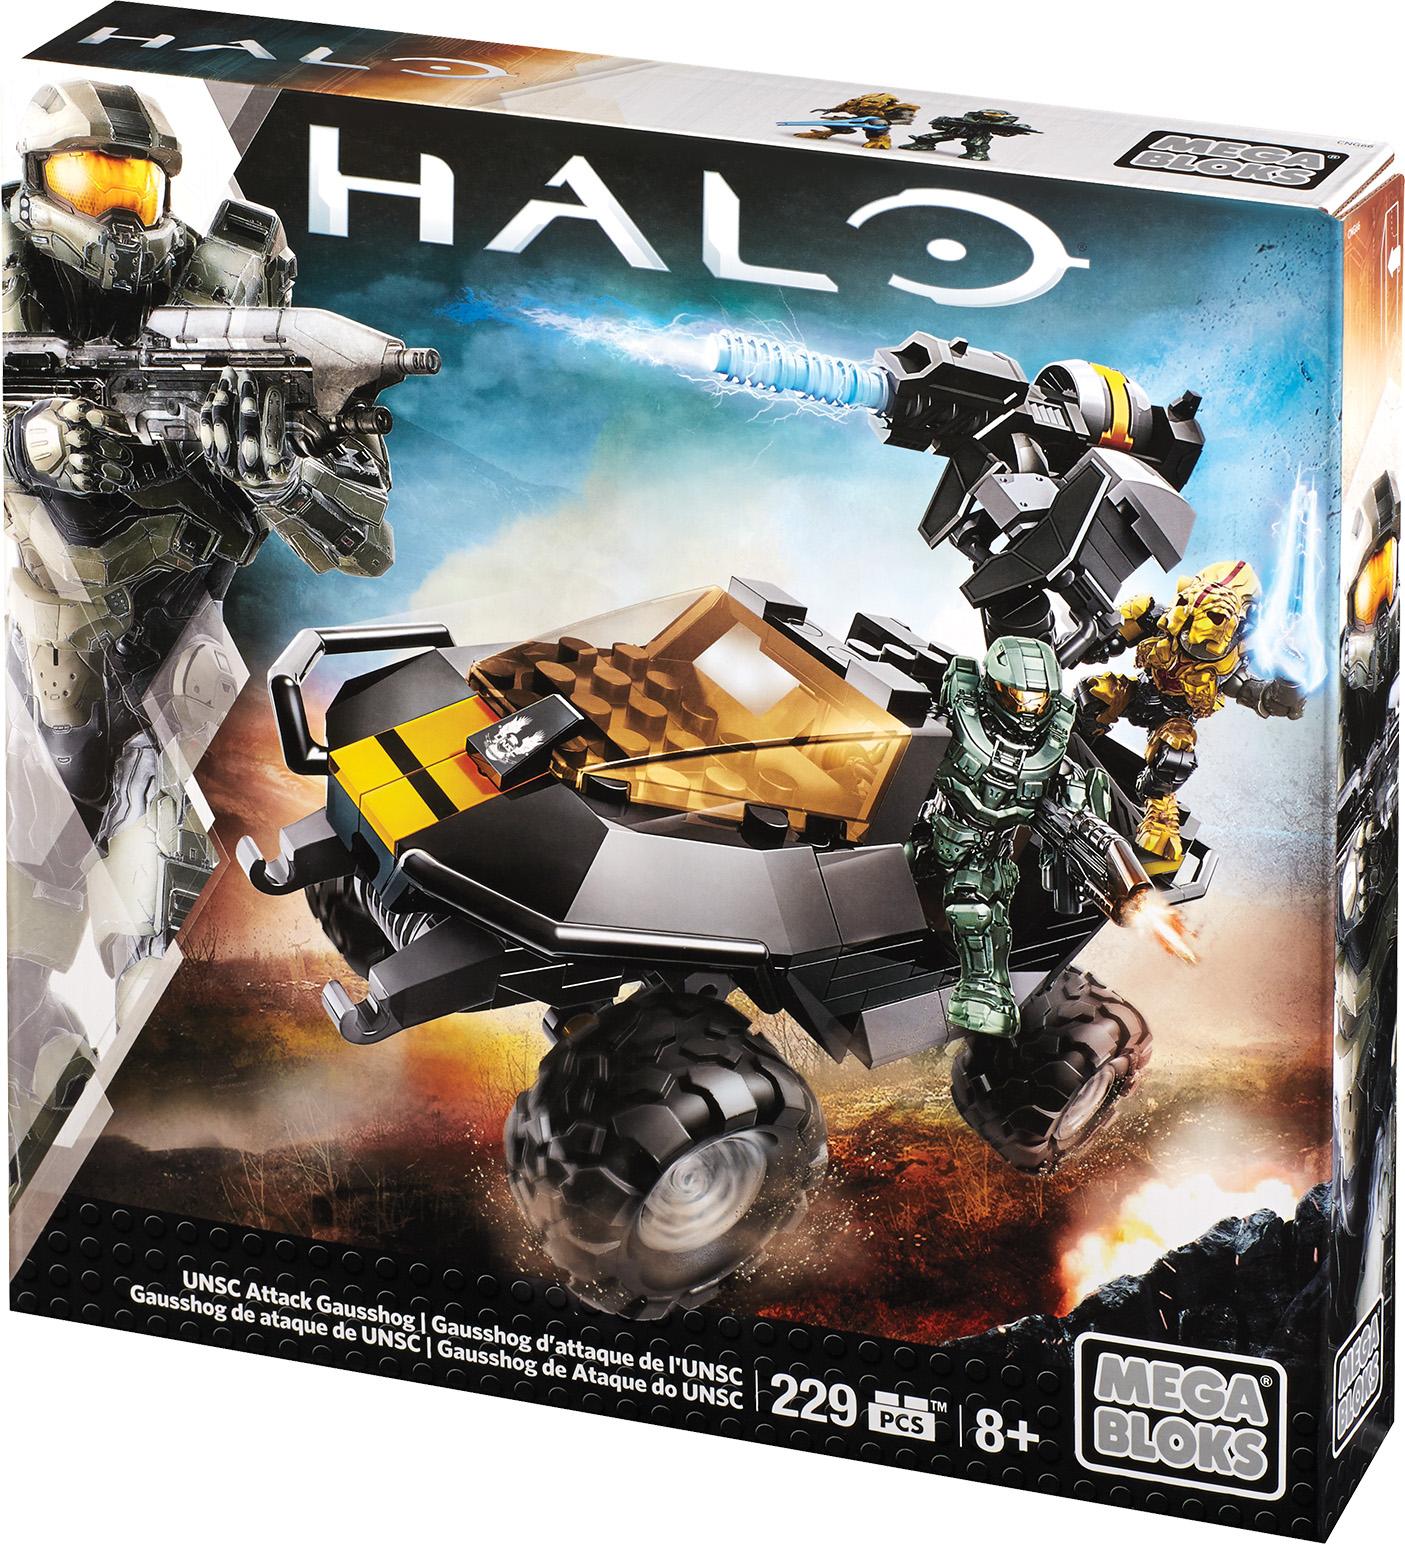 Mega Bloks Halo UNSC Attack Gausshog Deal